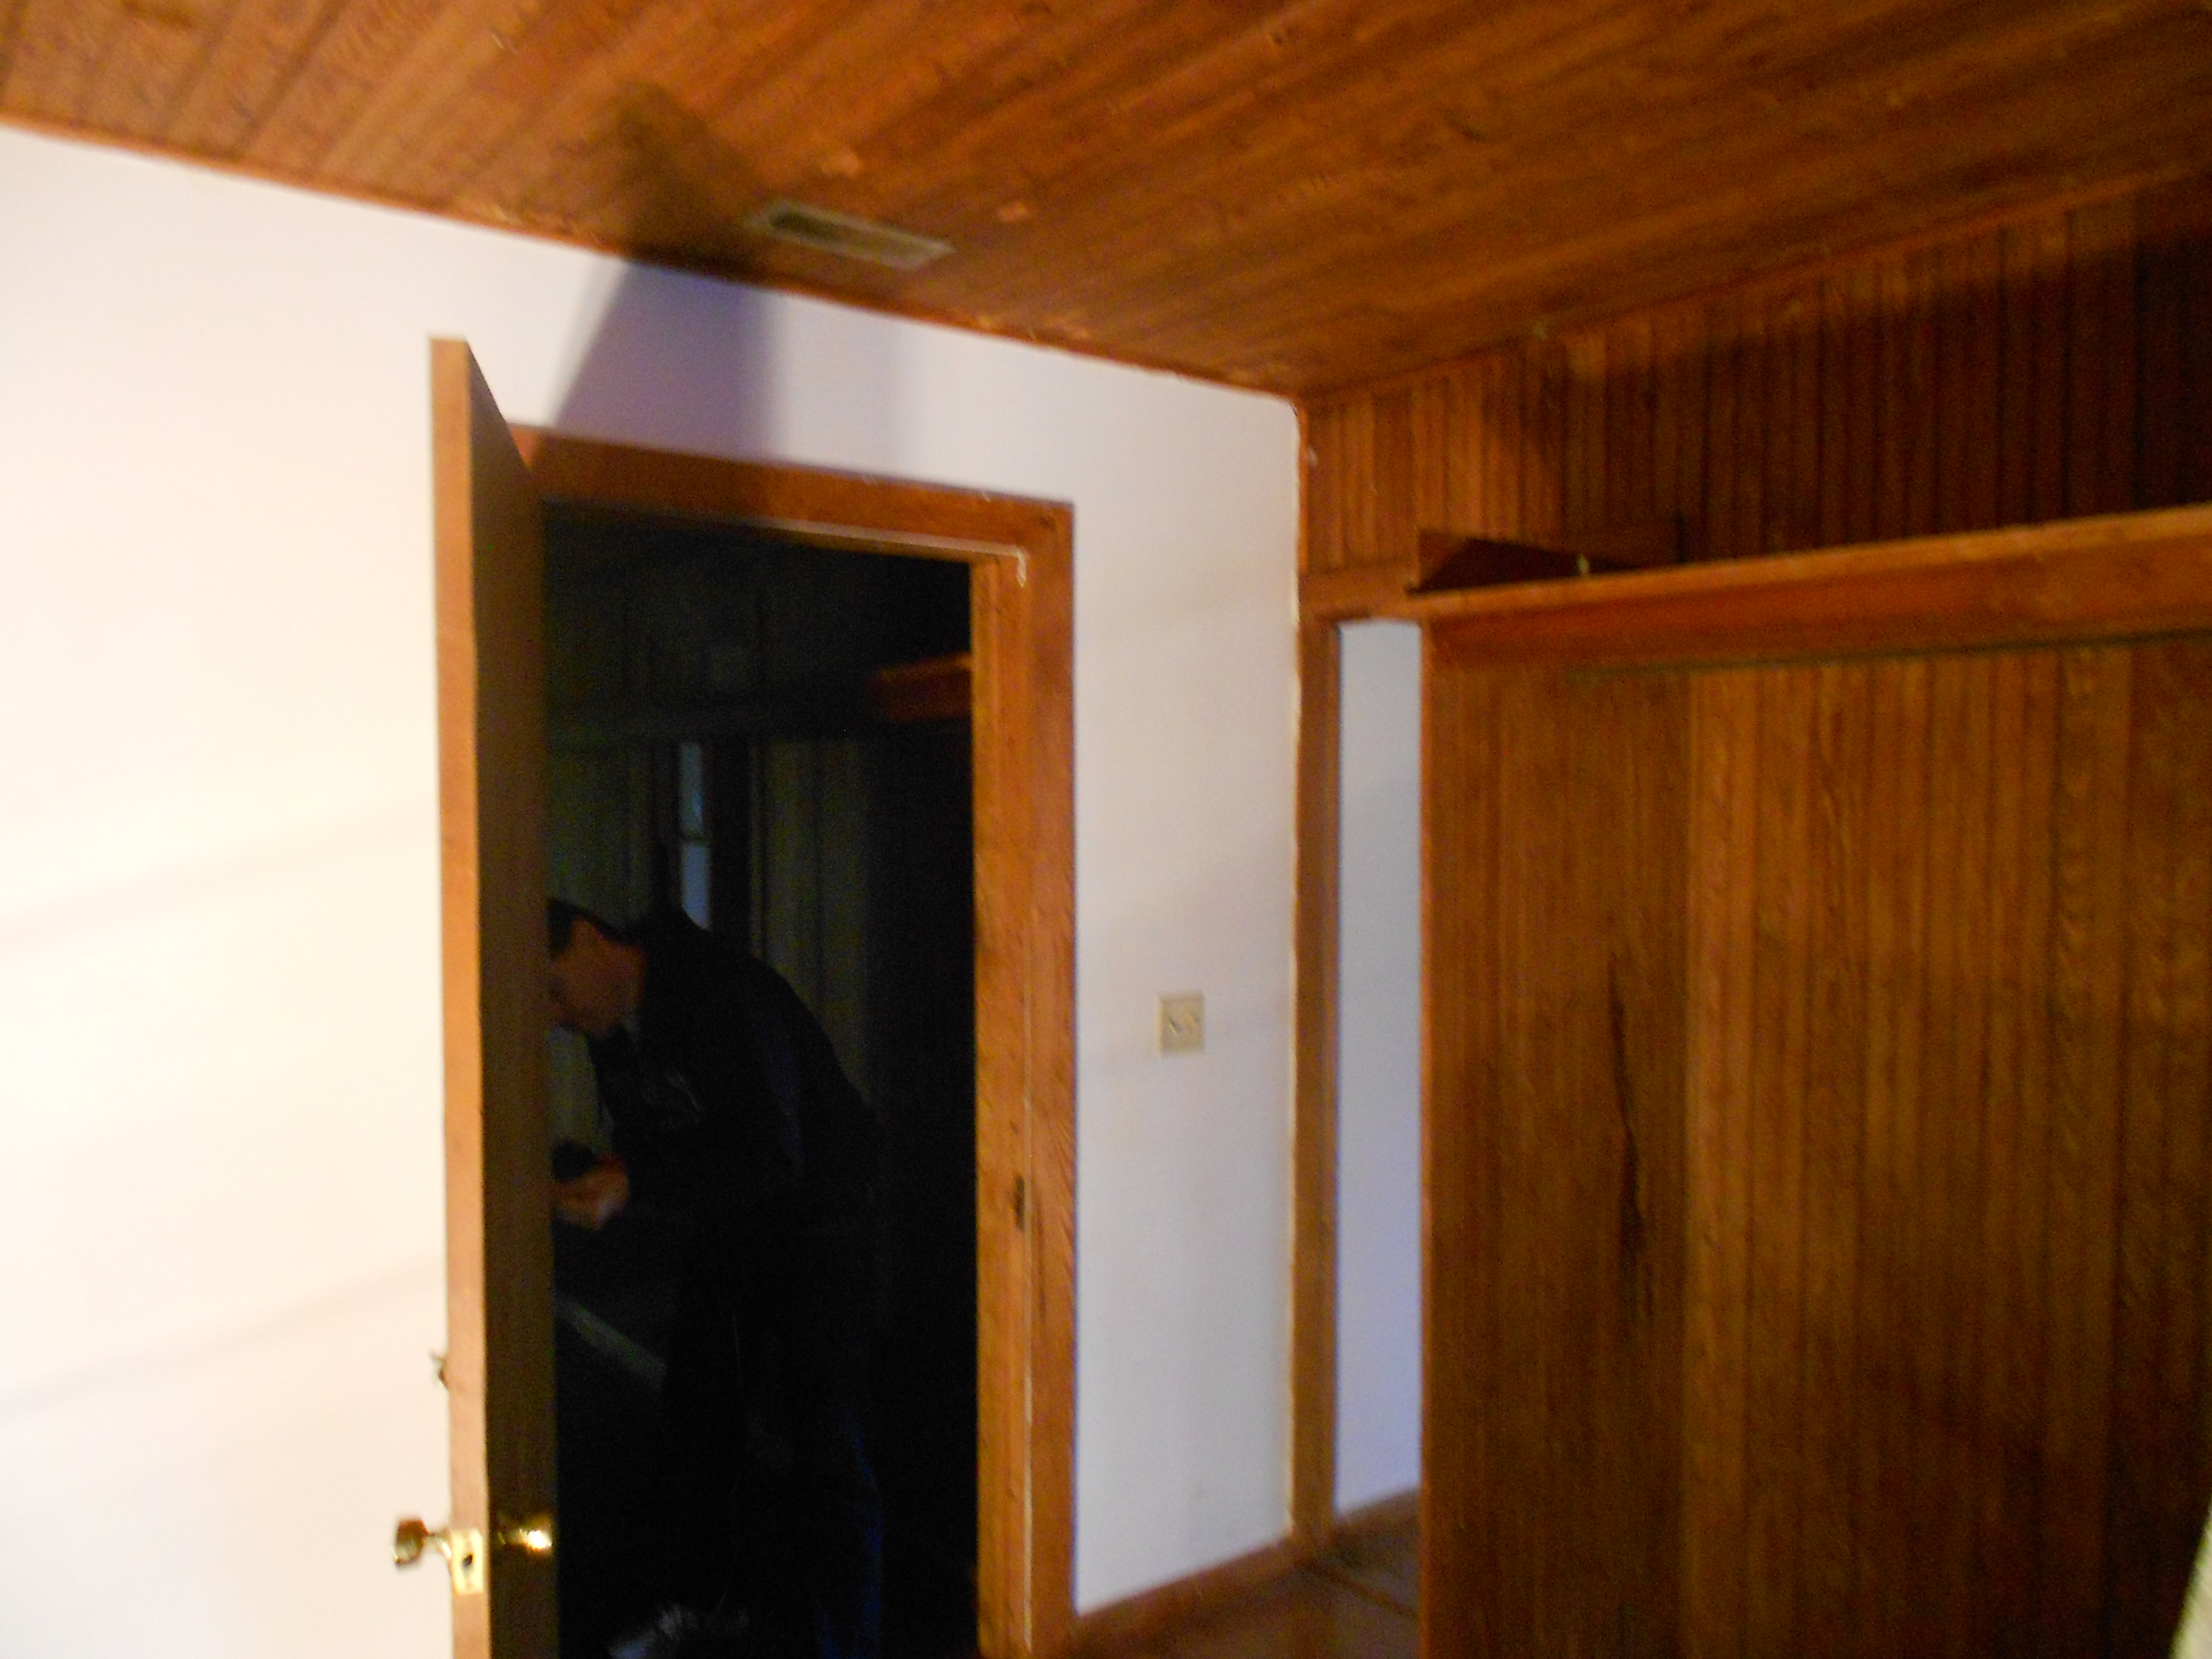 Door separating the apartments